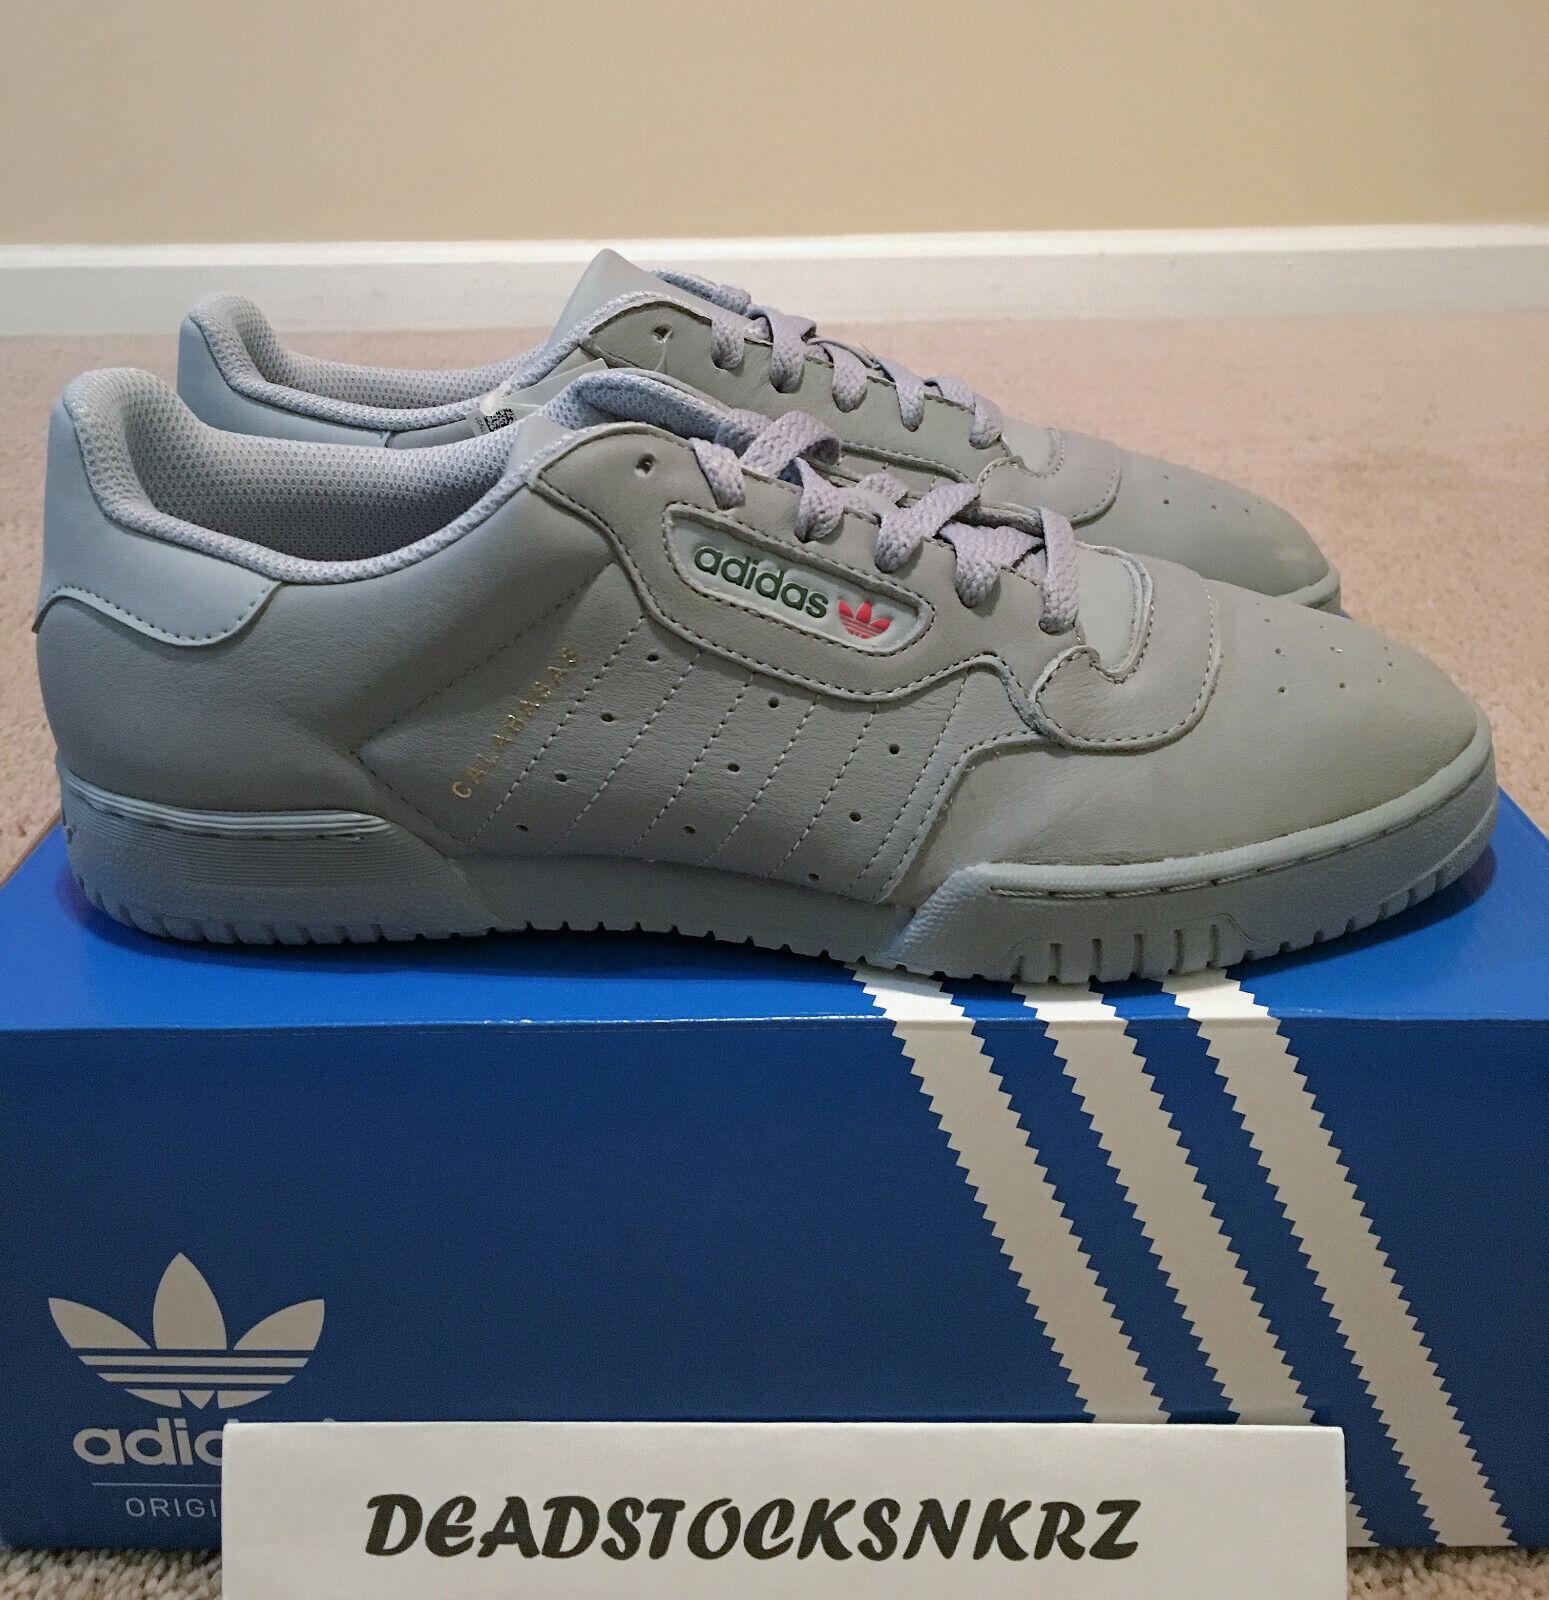 Adidas Yeezy Yeezy Yeezy Powerphase Calabasas GREY SUPCOL SUPCOL CG6422 With Receipt b15647